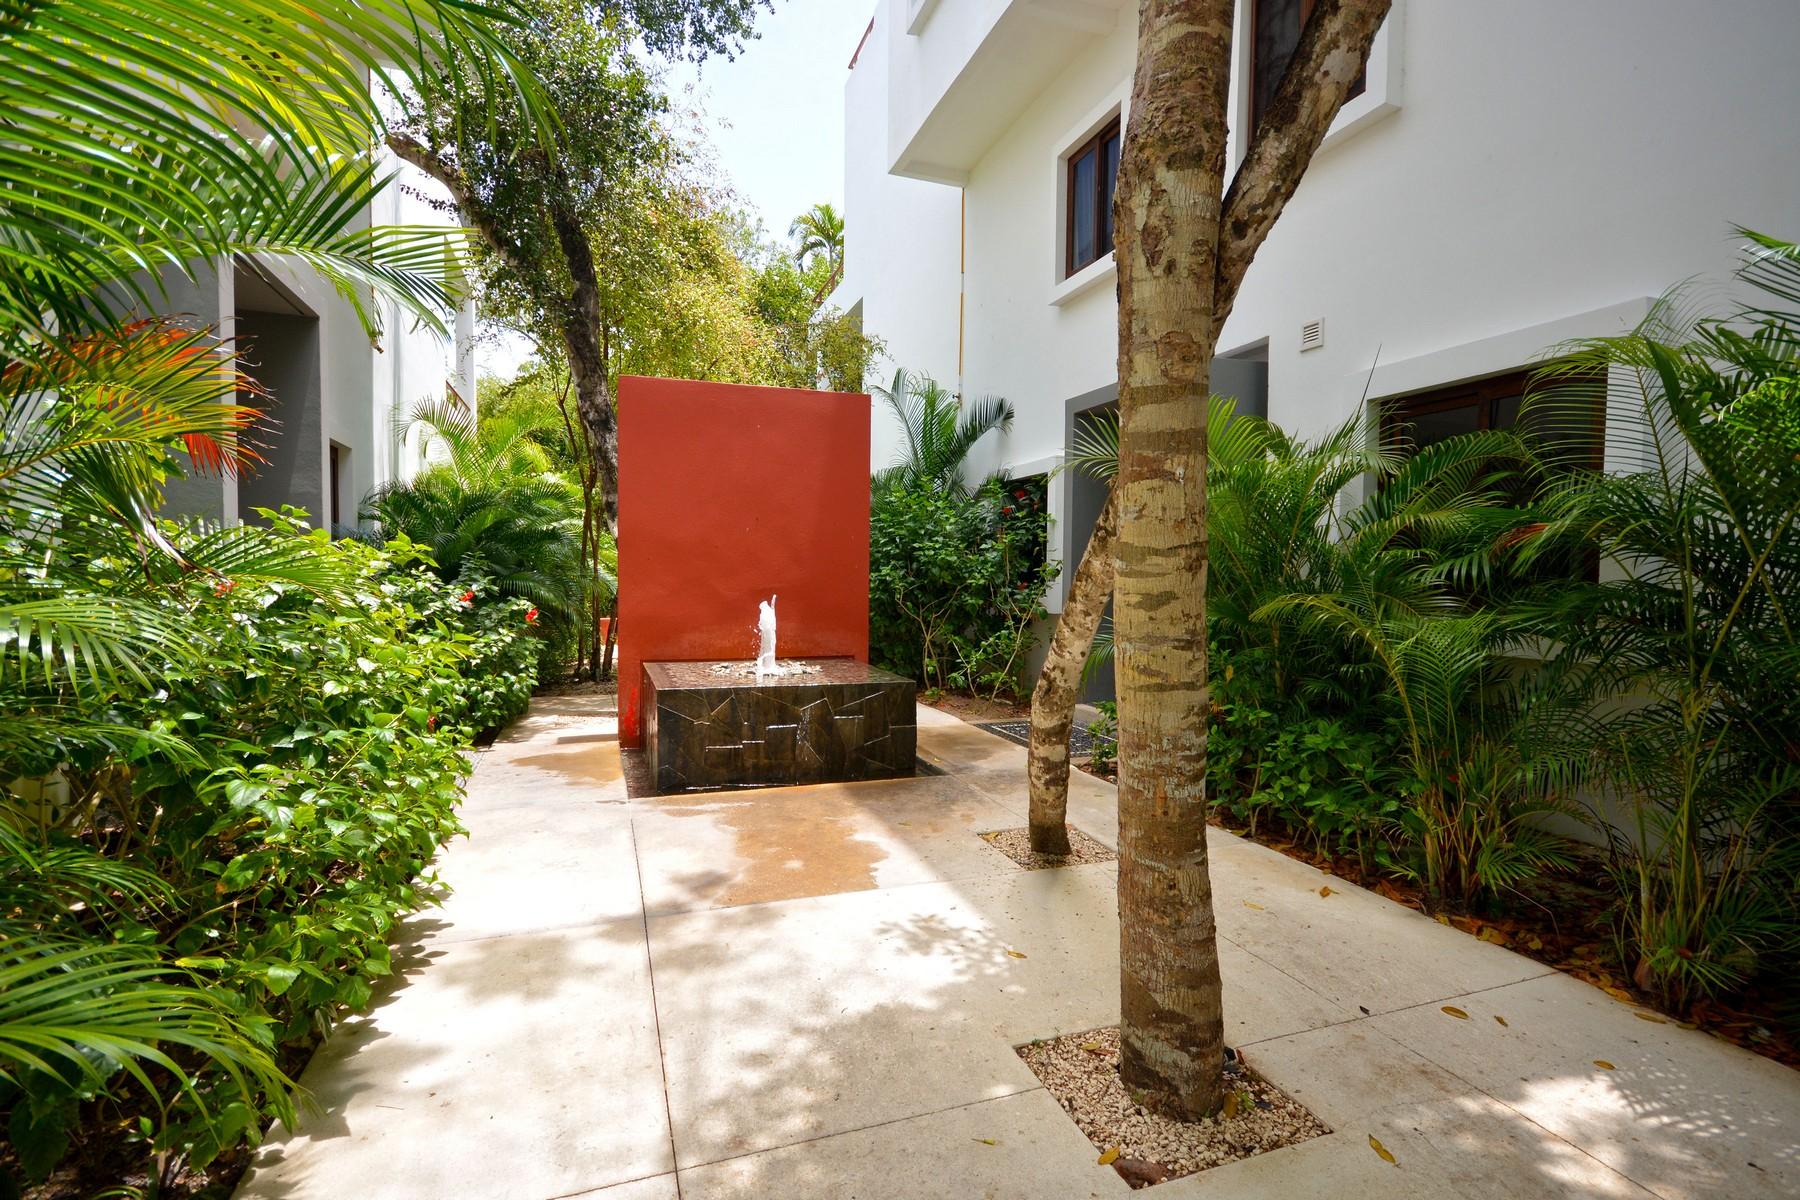 Additional photo for property listing at PH INSPIRATION PH Tao Community Carretera federal chetumal- B.Juarez km 250 Akumal, Quintana Roo 77750 México